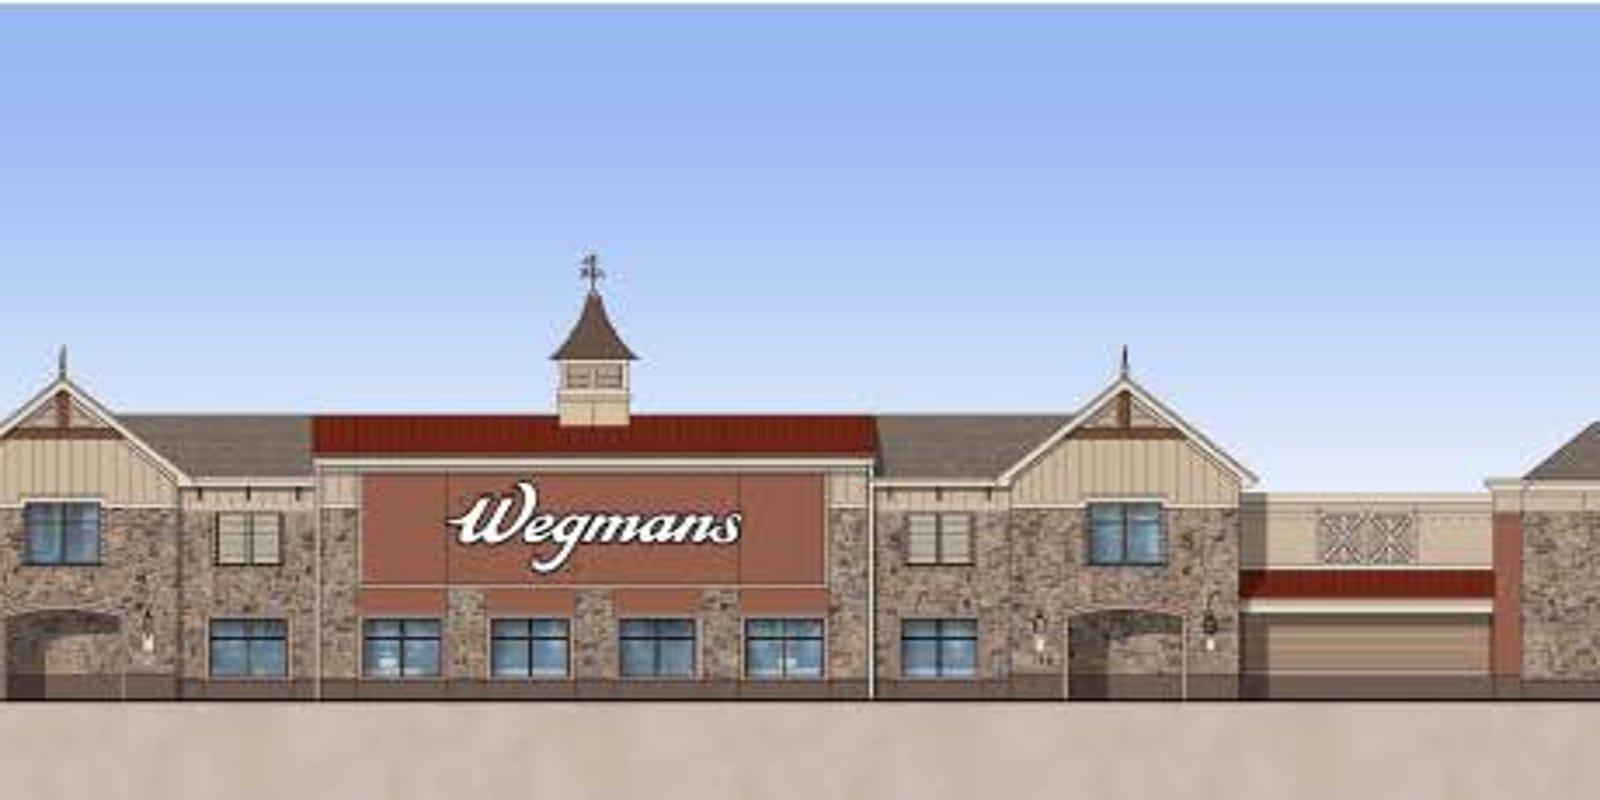 Wegman S Opens Hiring For Hanover Store